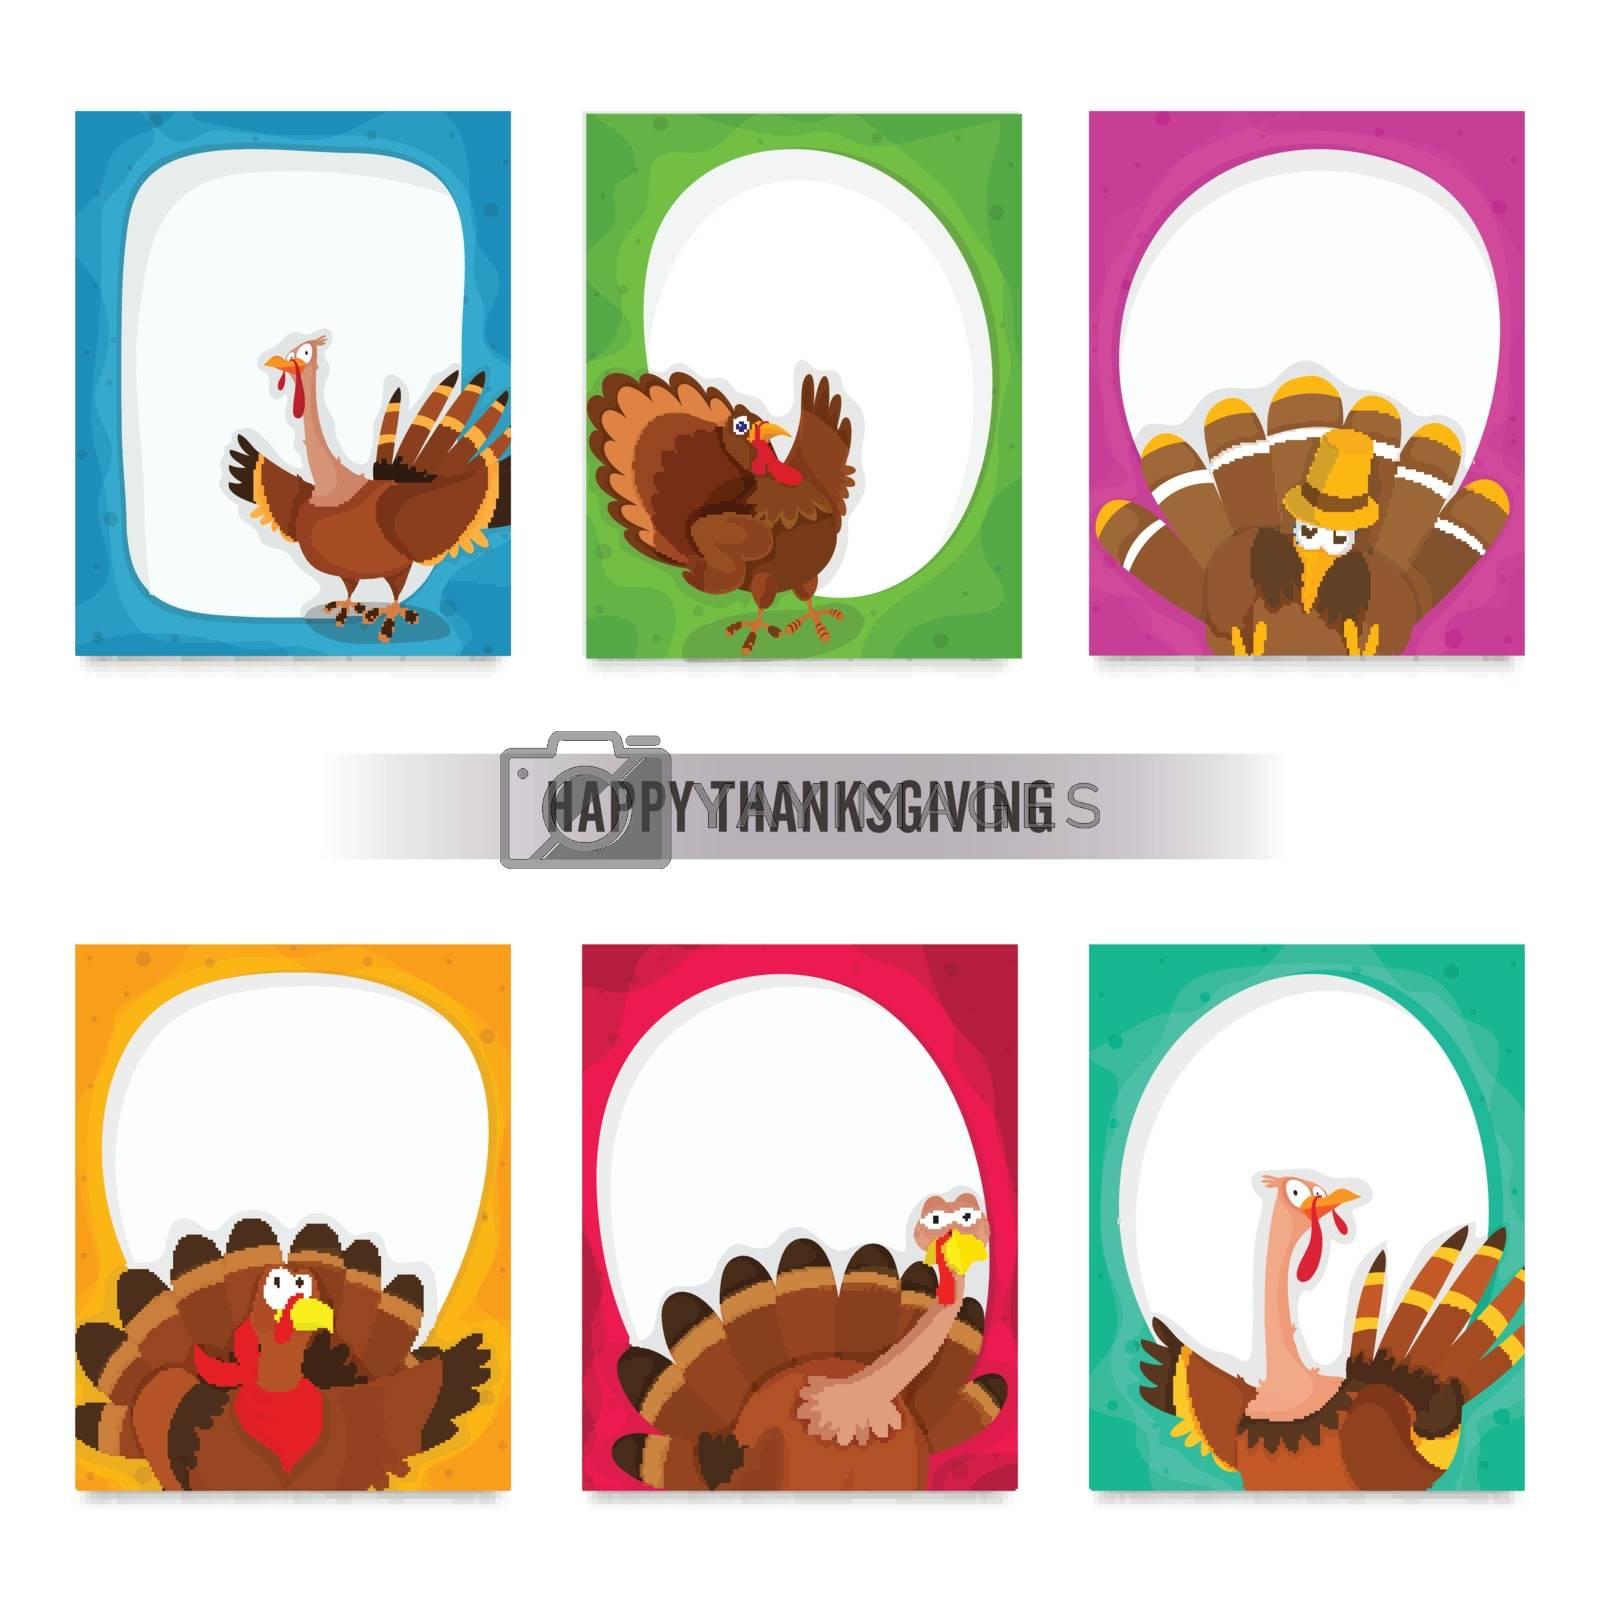 Happy Thanksgiving Day greeting card set with illustration of turkey bird, Creative vector illustration.